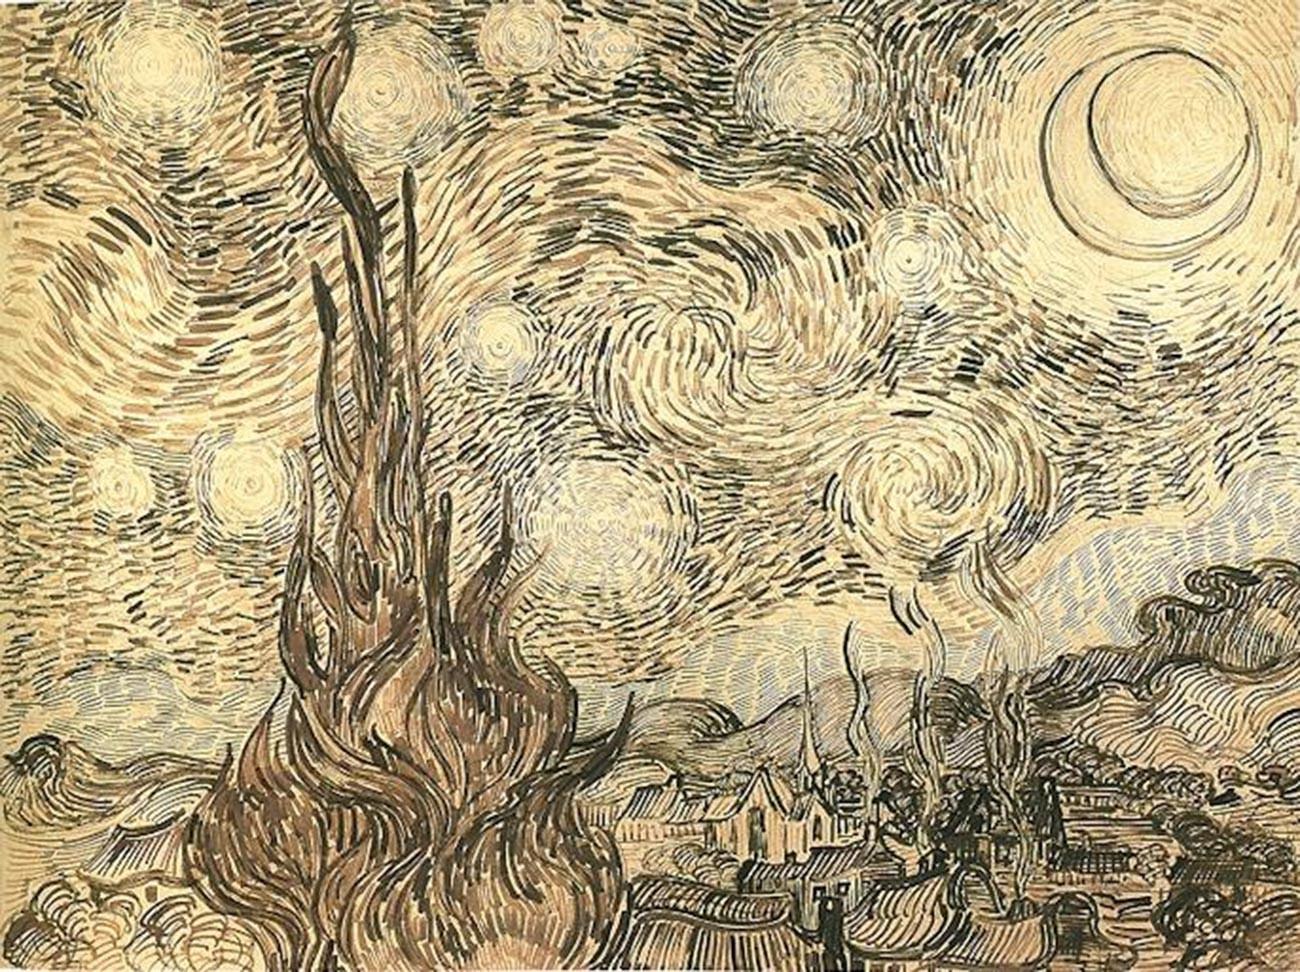 Vincent Van Gogh. Zvezdnata noč